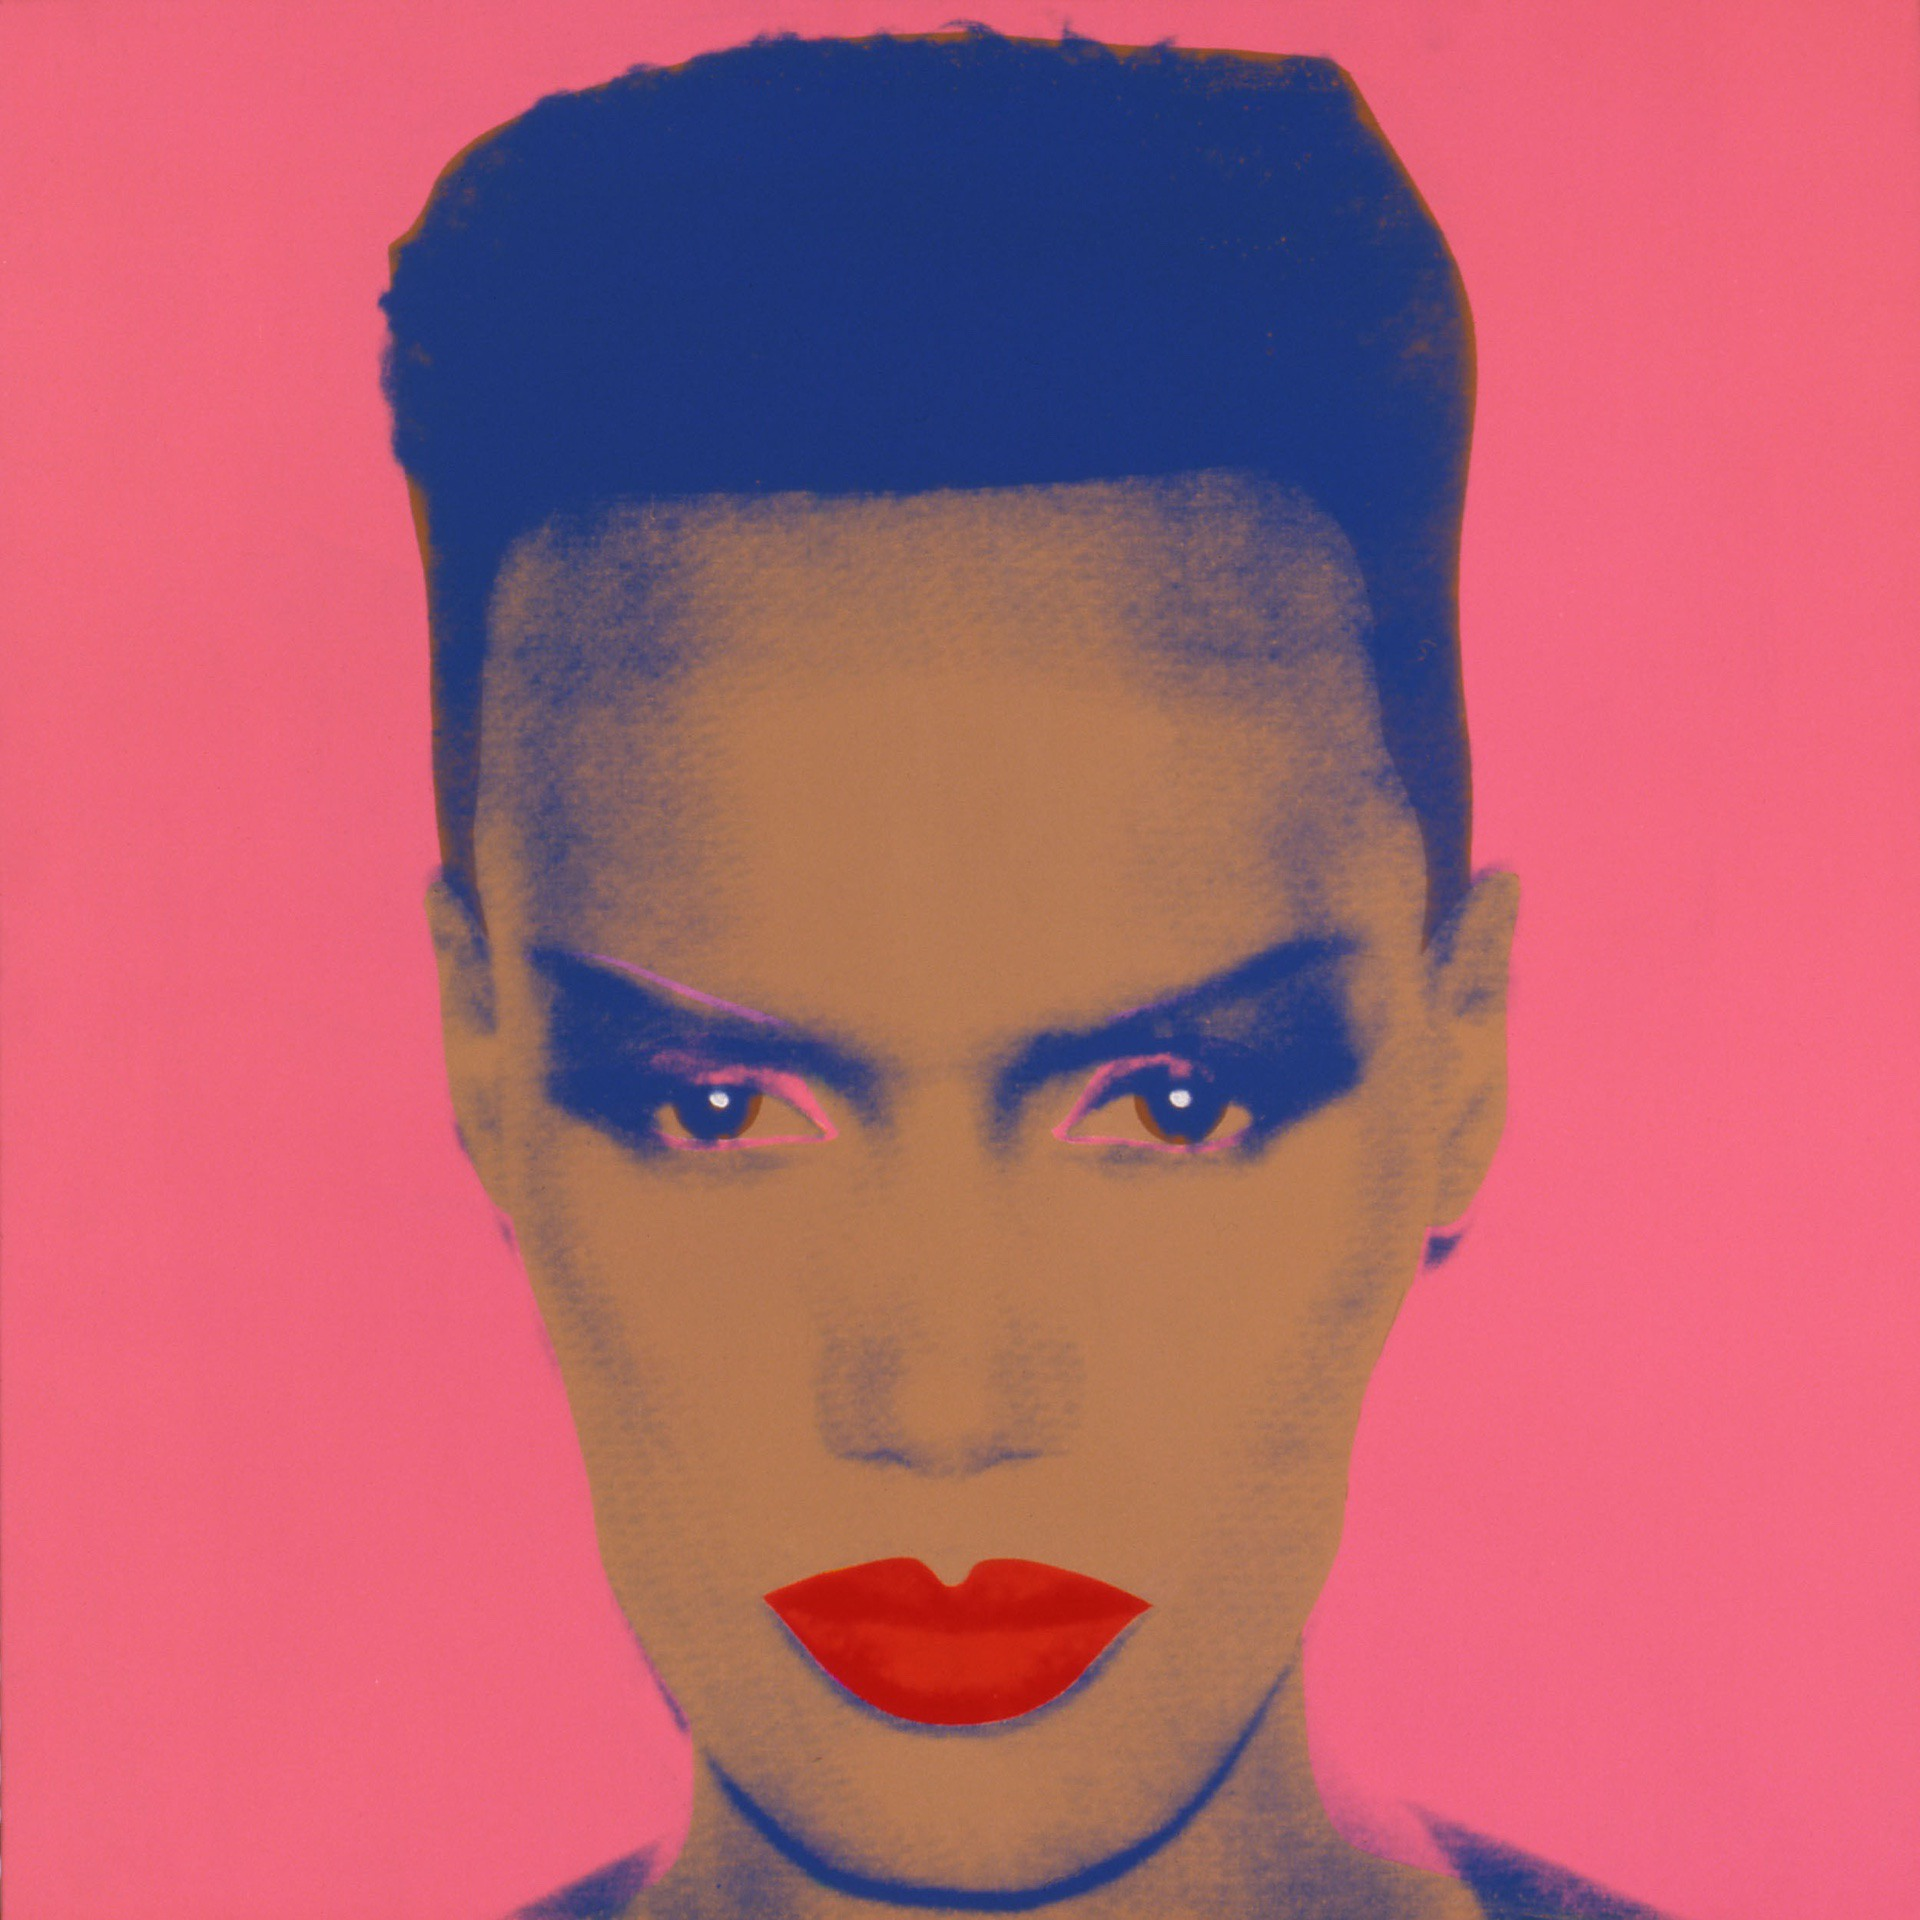 Grace Jones (1986) by Andy Warhol - Pako Campo